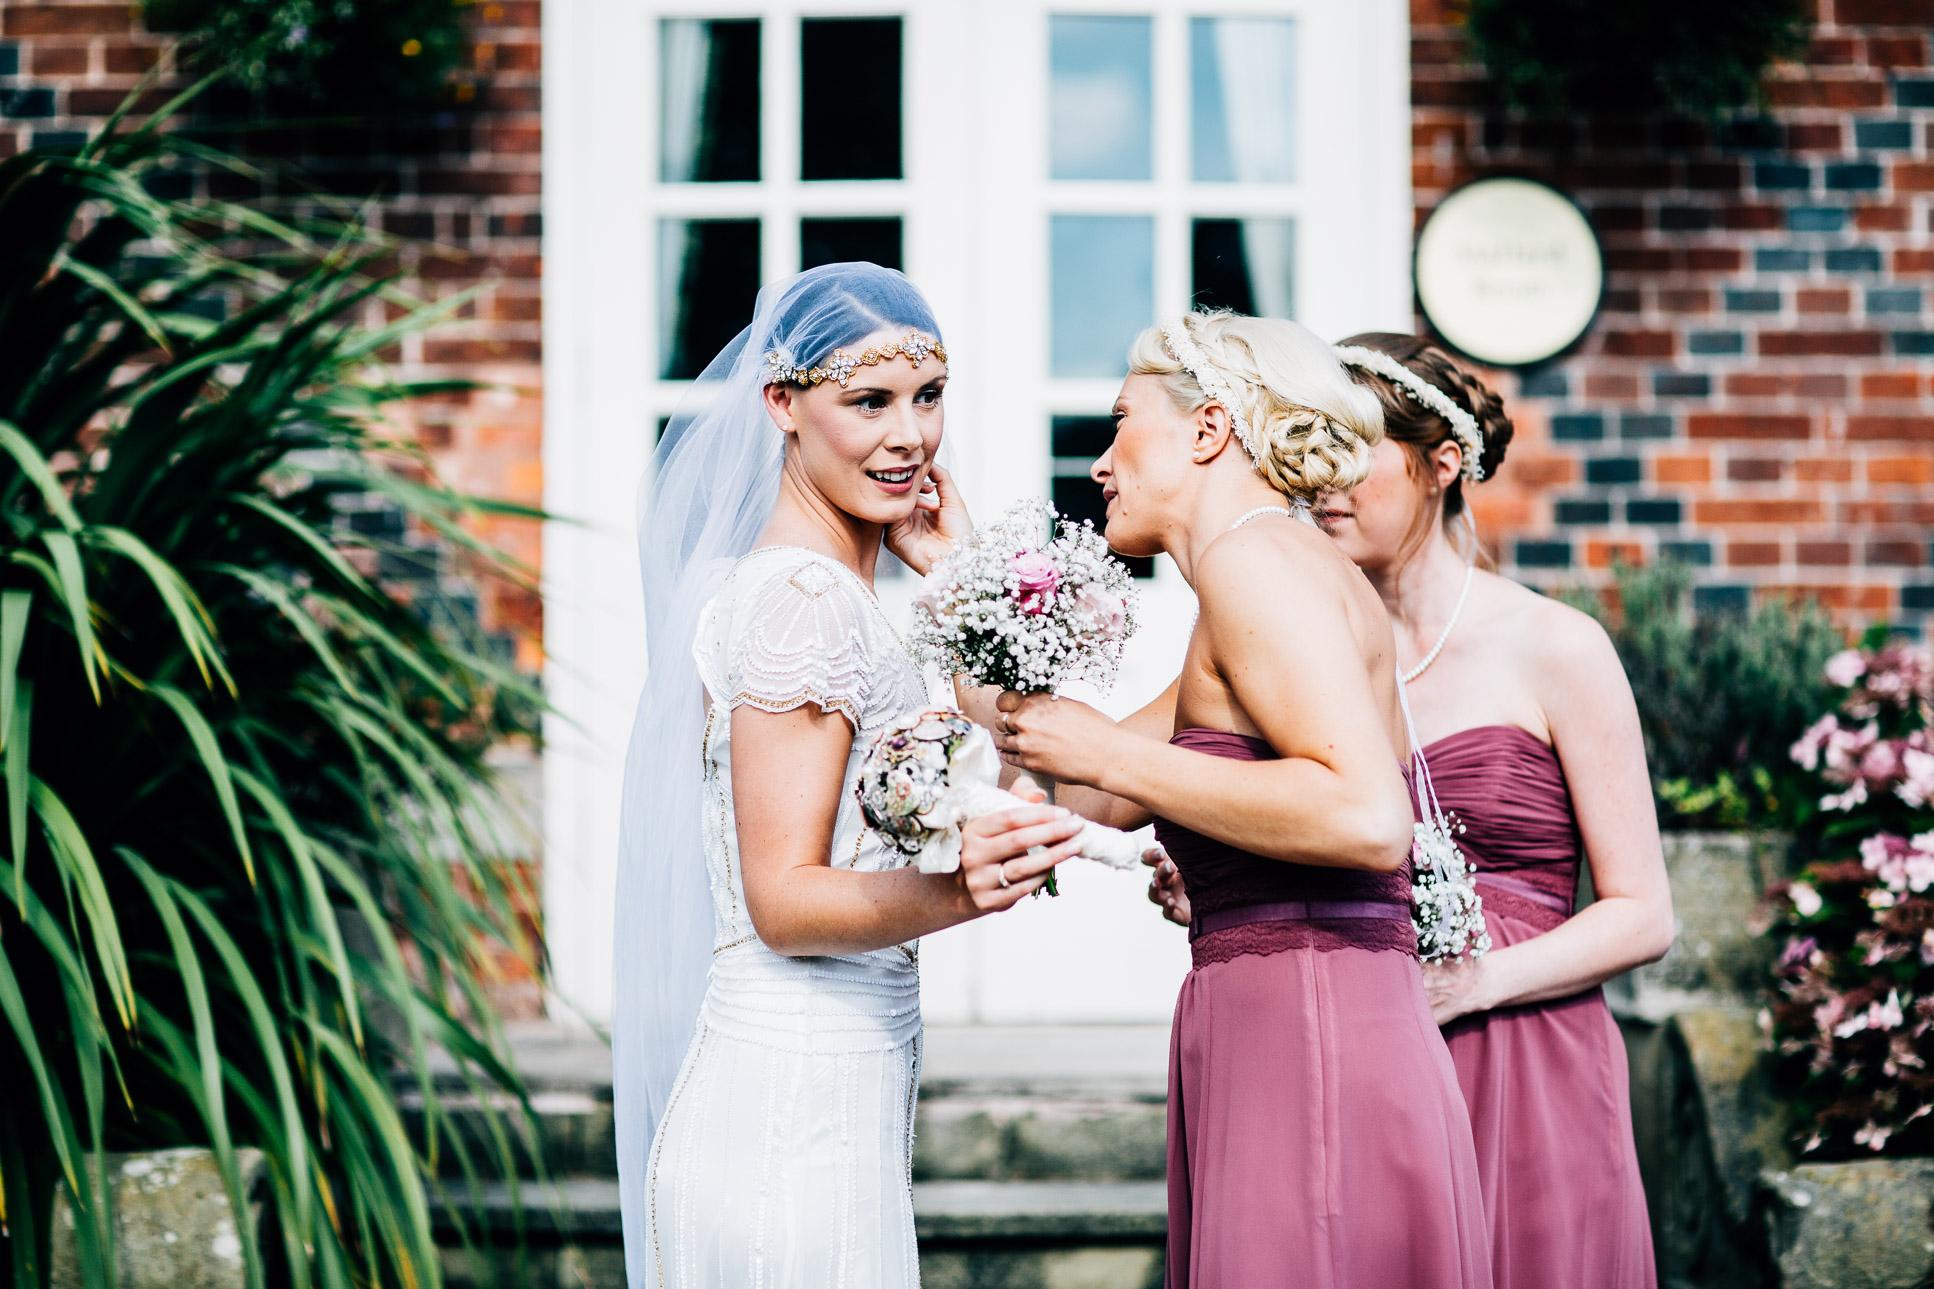 Blists Hill Wedding Photography Shropshire-58